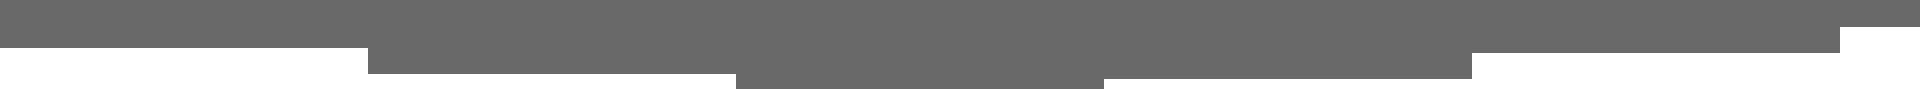 bordo grigio sotto menu